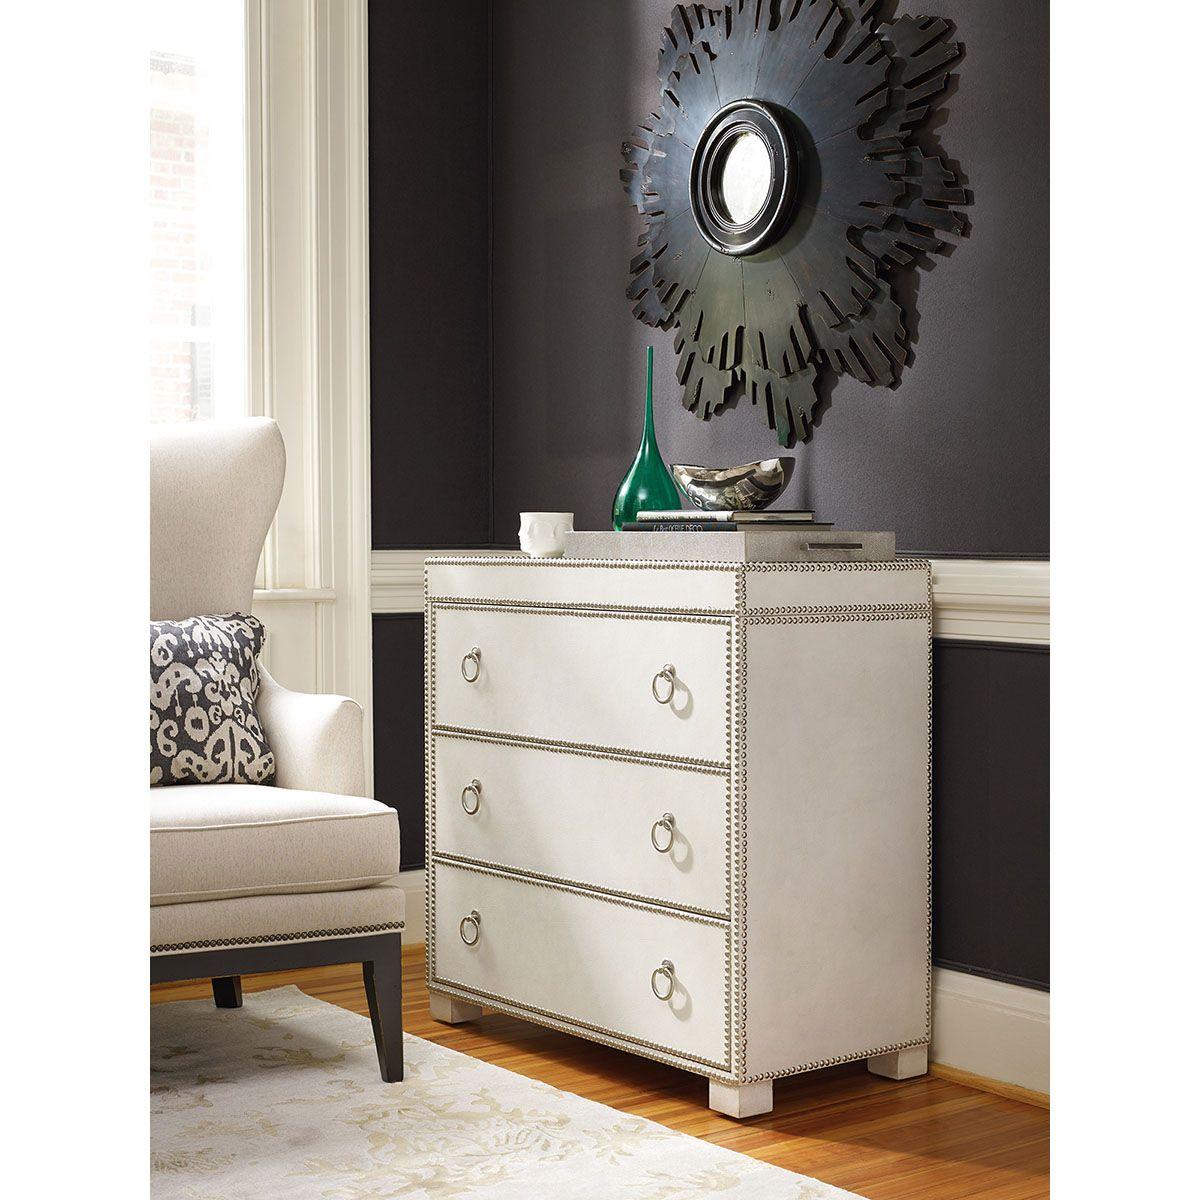 Hooker Furniture Three-Drawer Chest 5230-85001